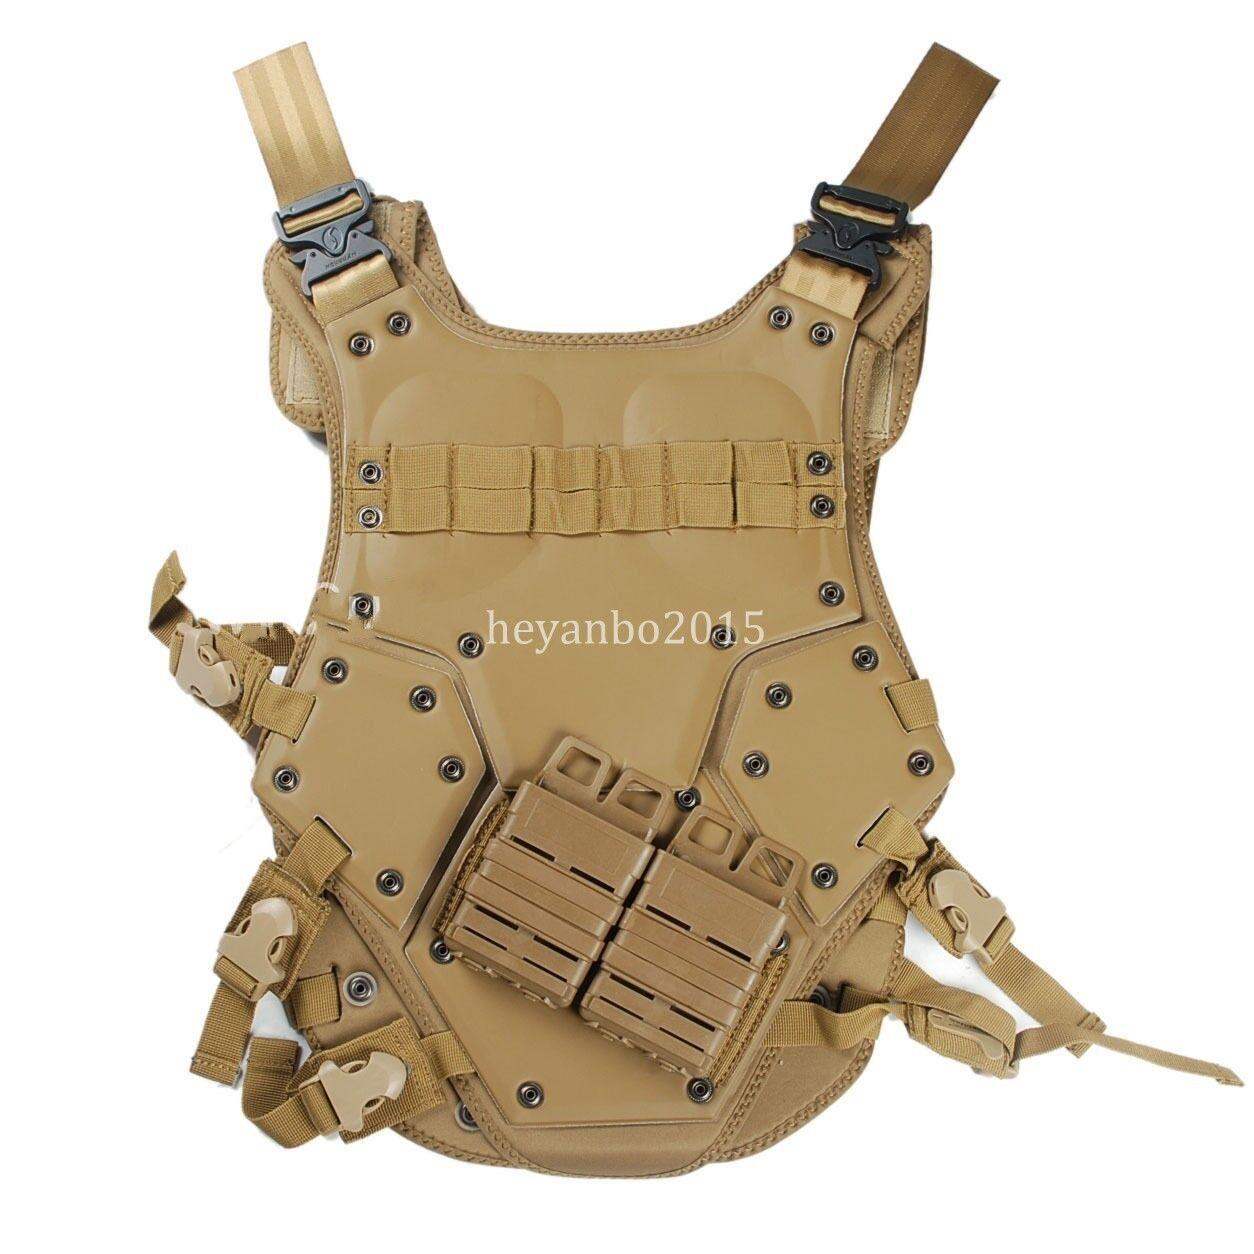 TACTICAL AIRSOFT CS PredECTIVE TMC COSPLAY TMC TF3 HUNTING SWAT MUD SWAT